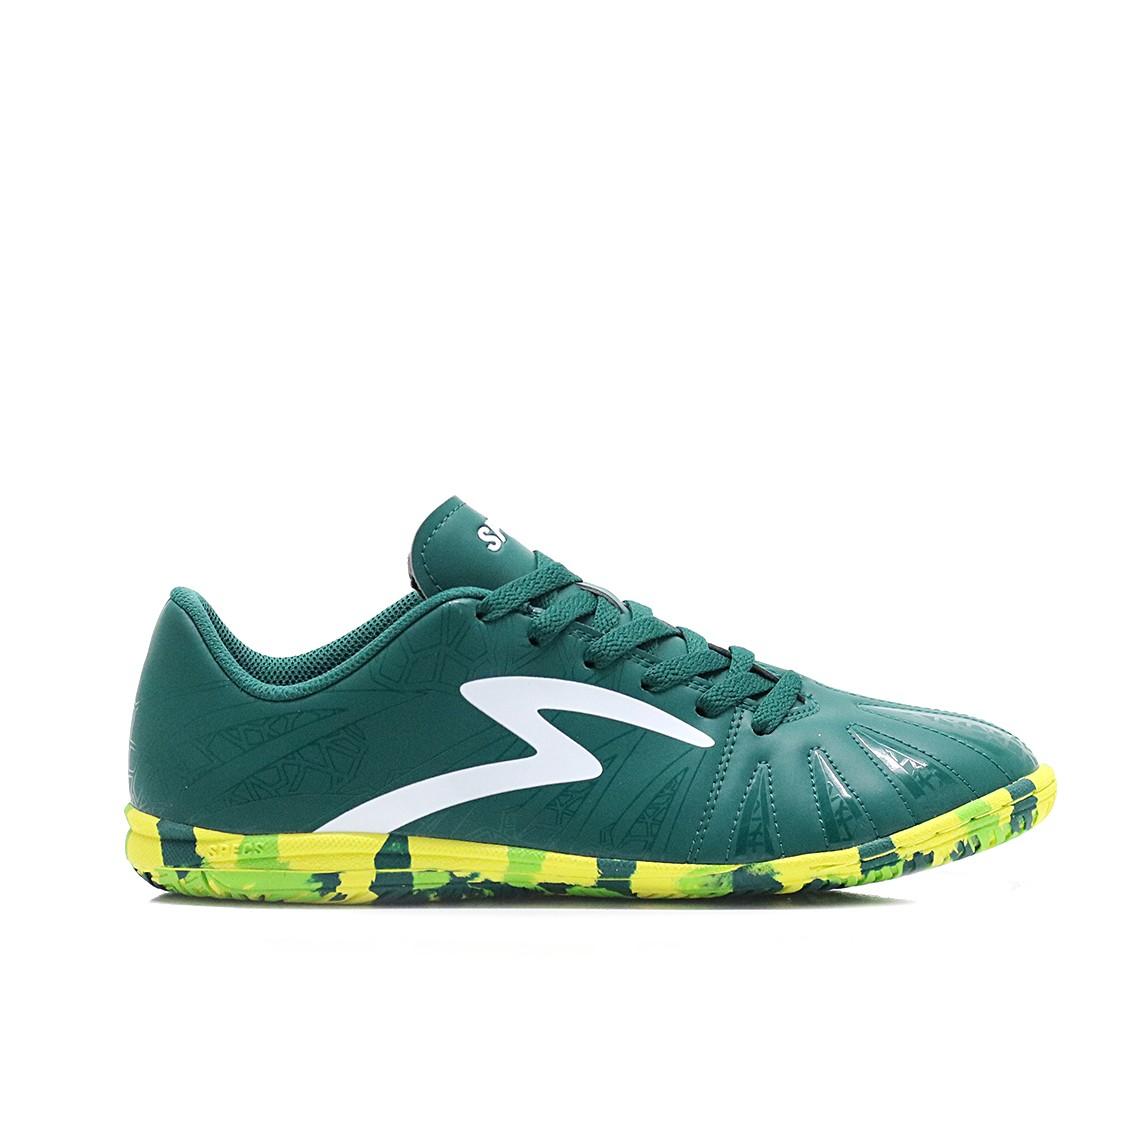 Jual Sepatu Futsal Specs Tomahawk In - Moss Green Spot